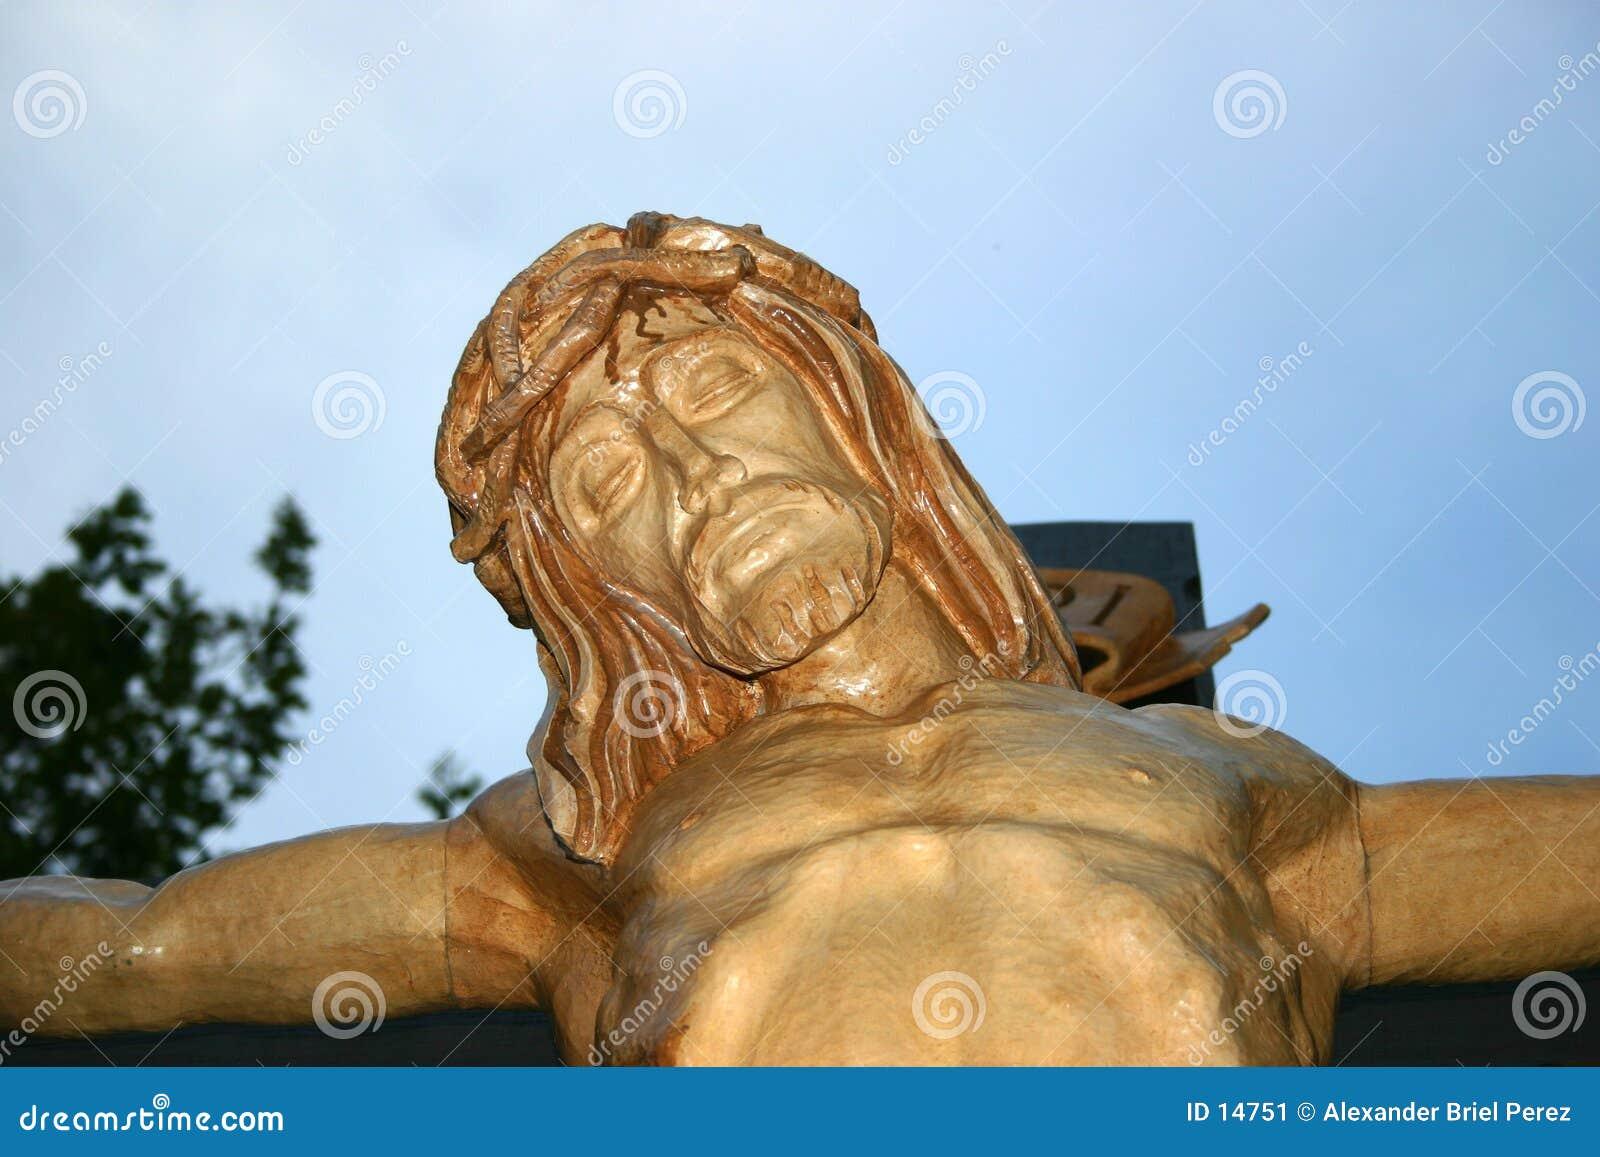 The jesus 02